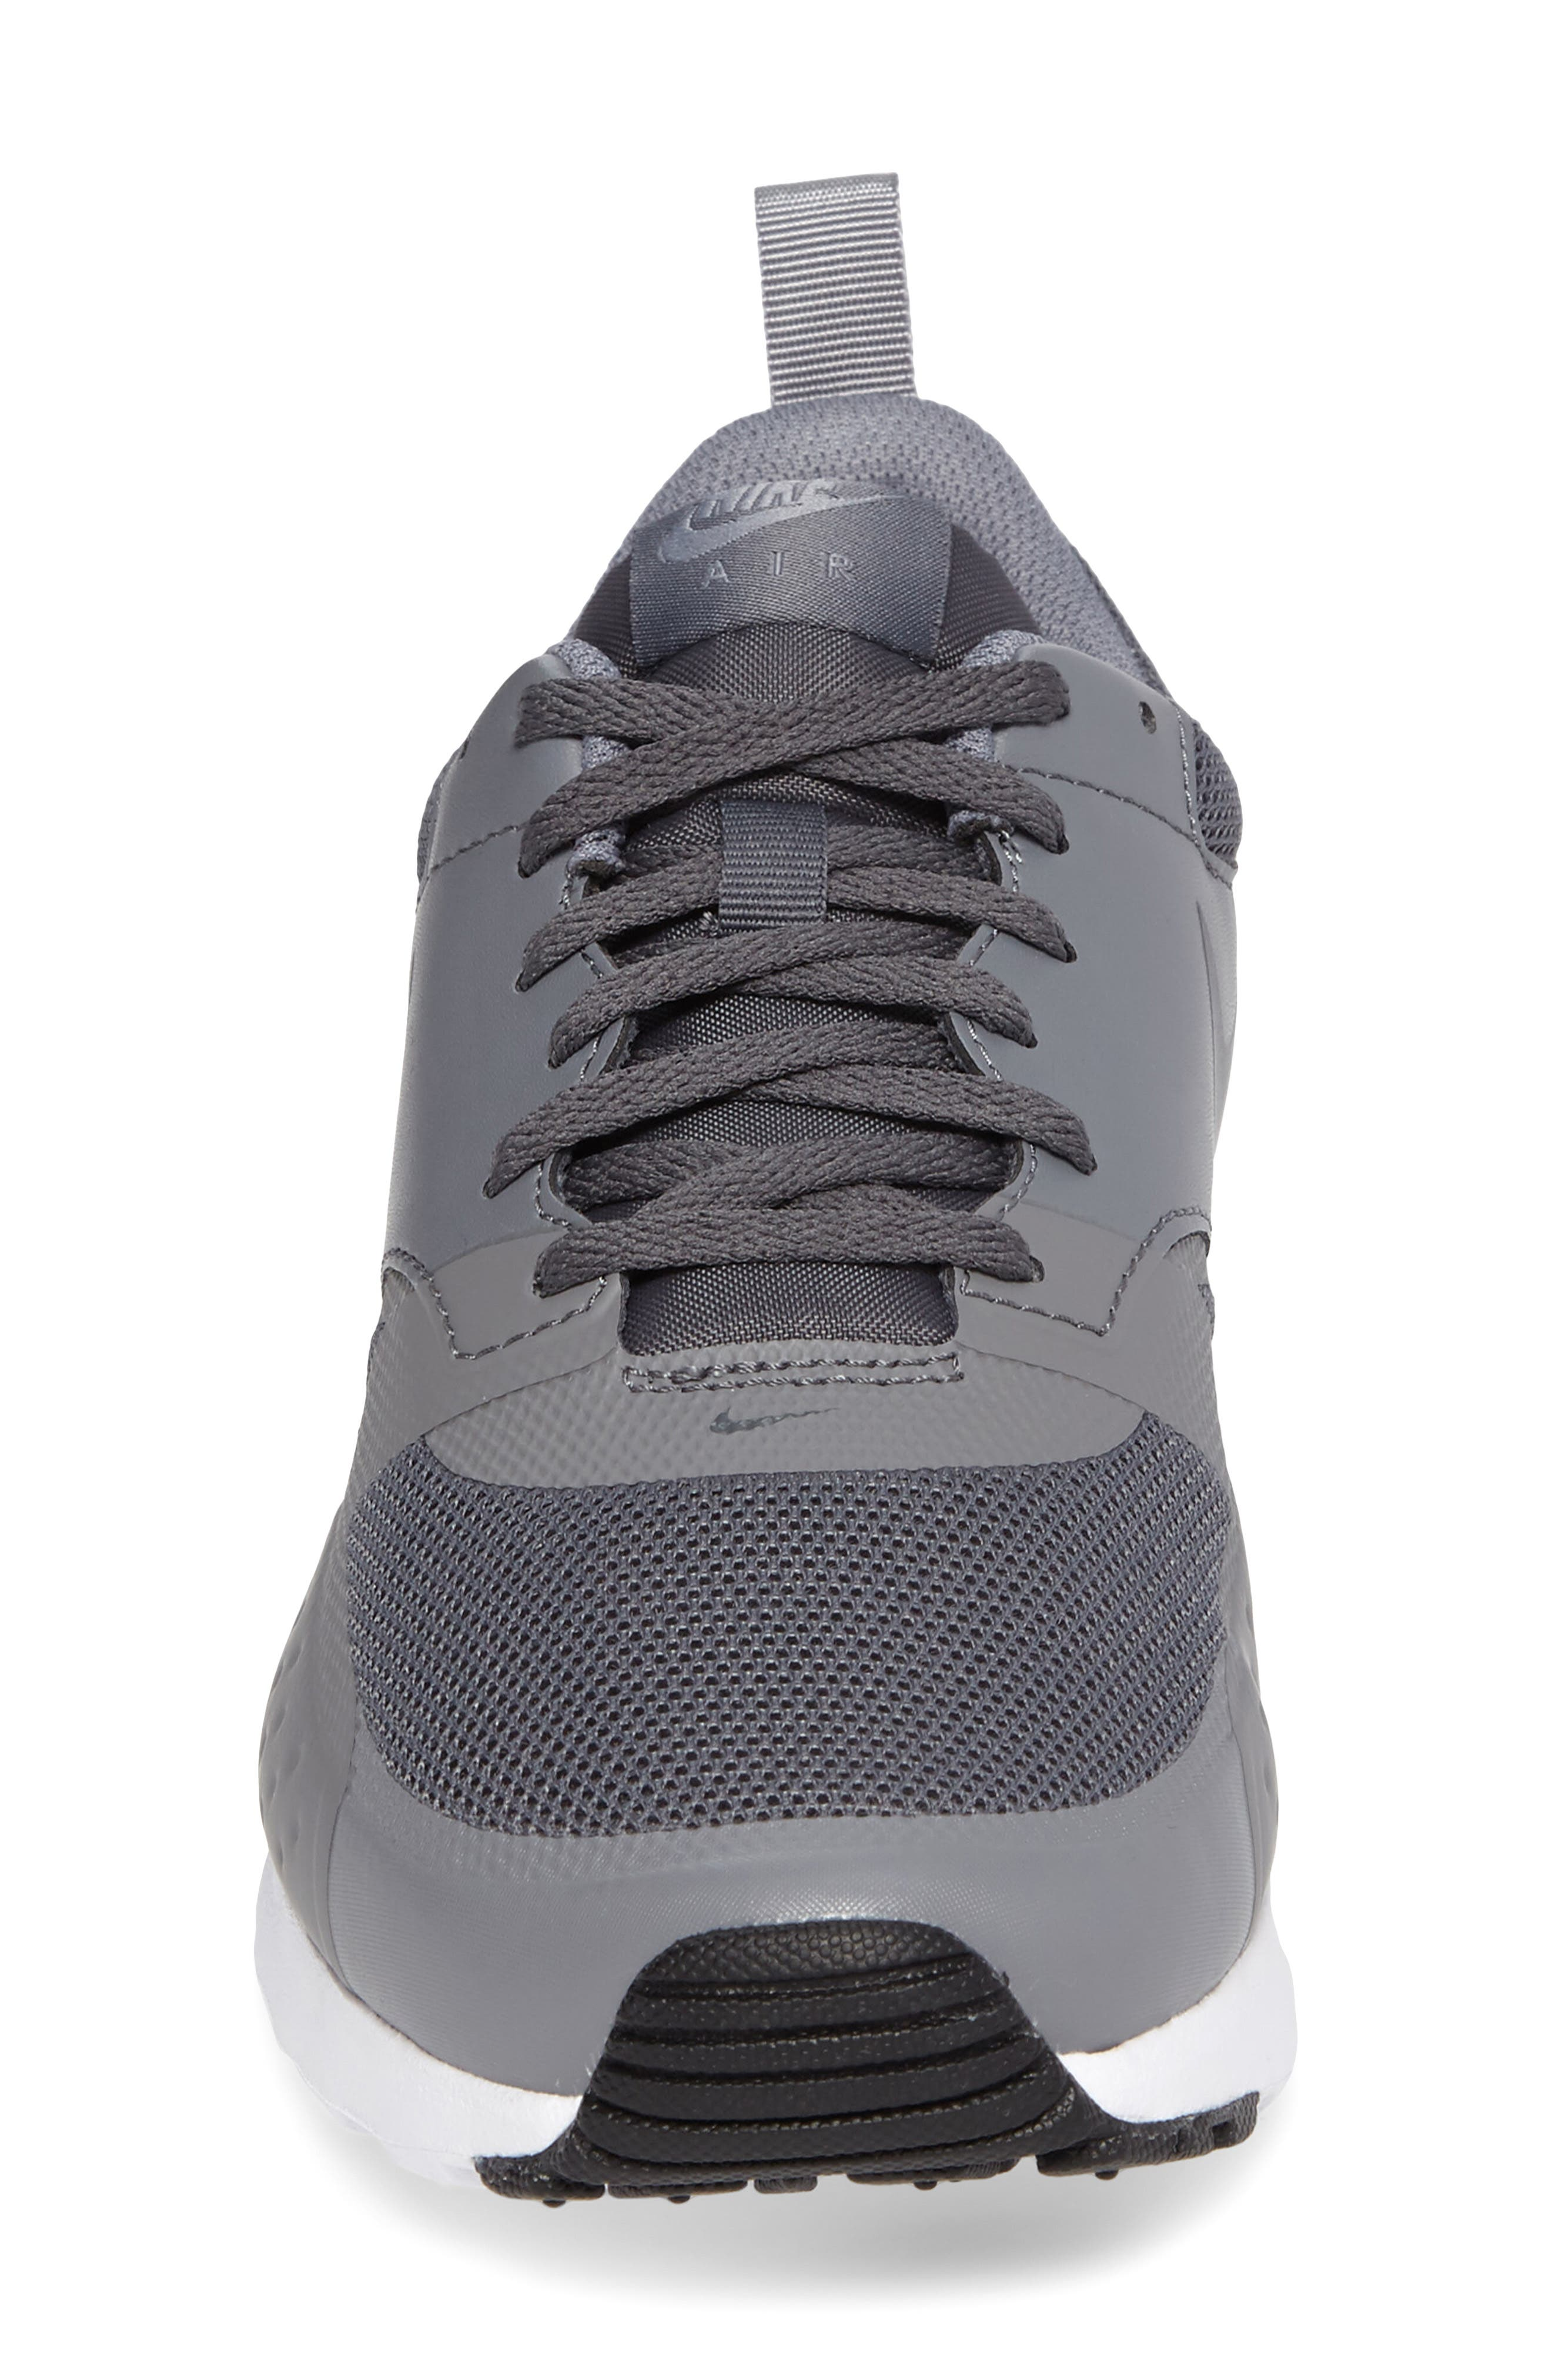 Air Max Vision Sneaker,                             Alternate thumbnail 4, color,                             Cool Grey/ Dark Grey/ White